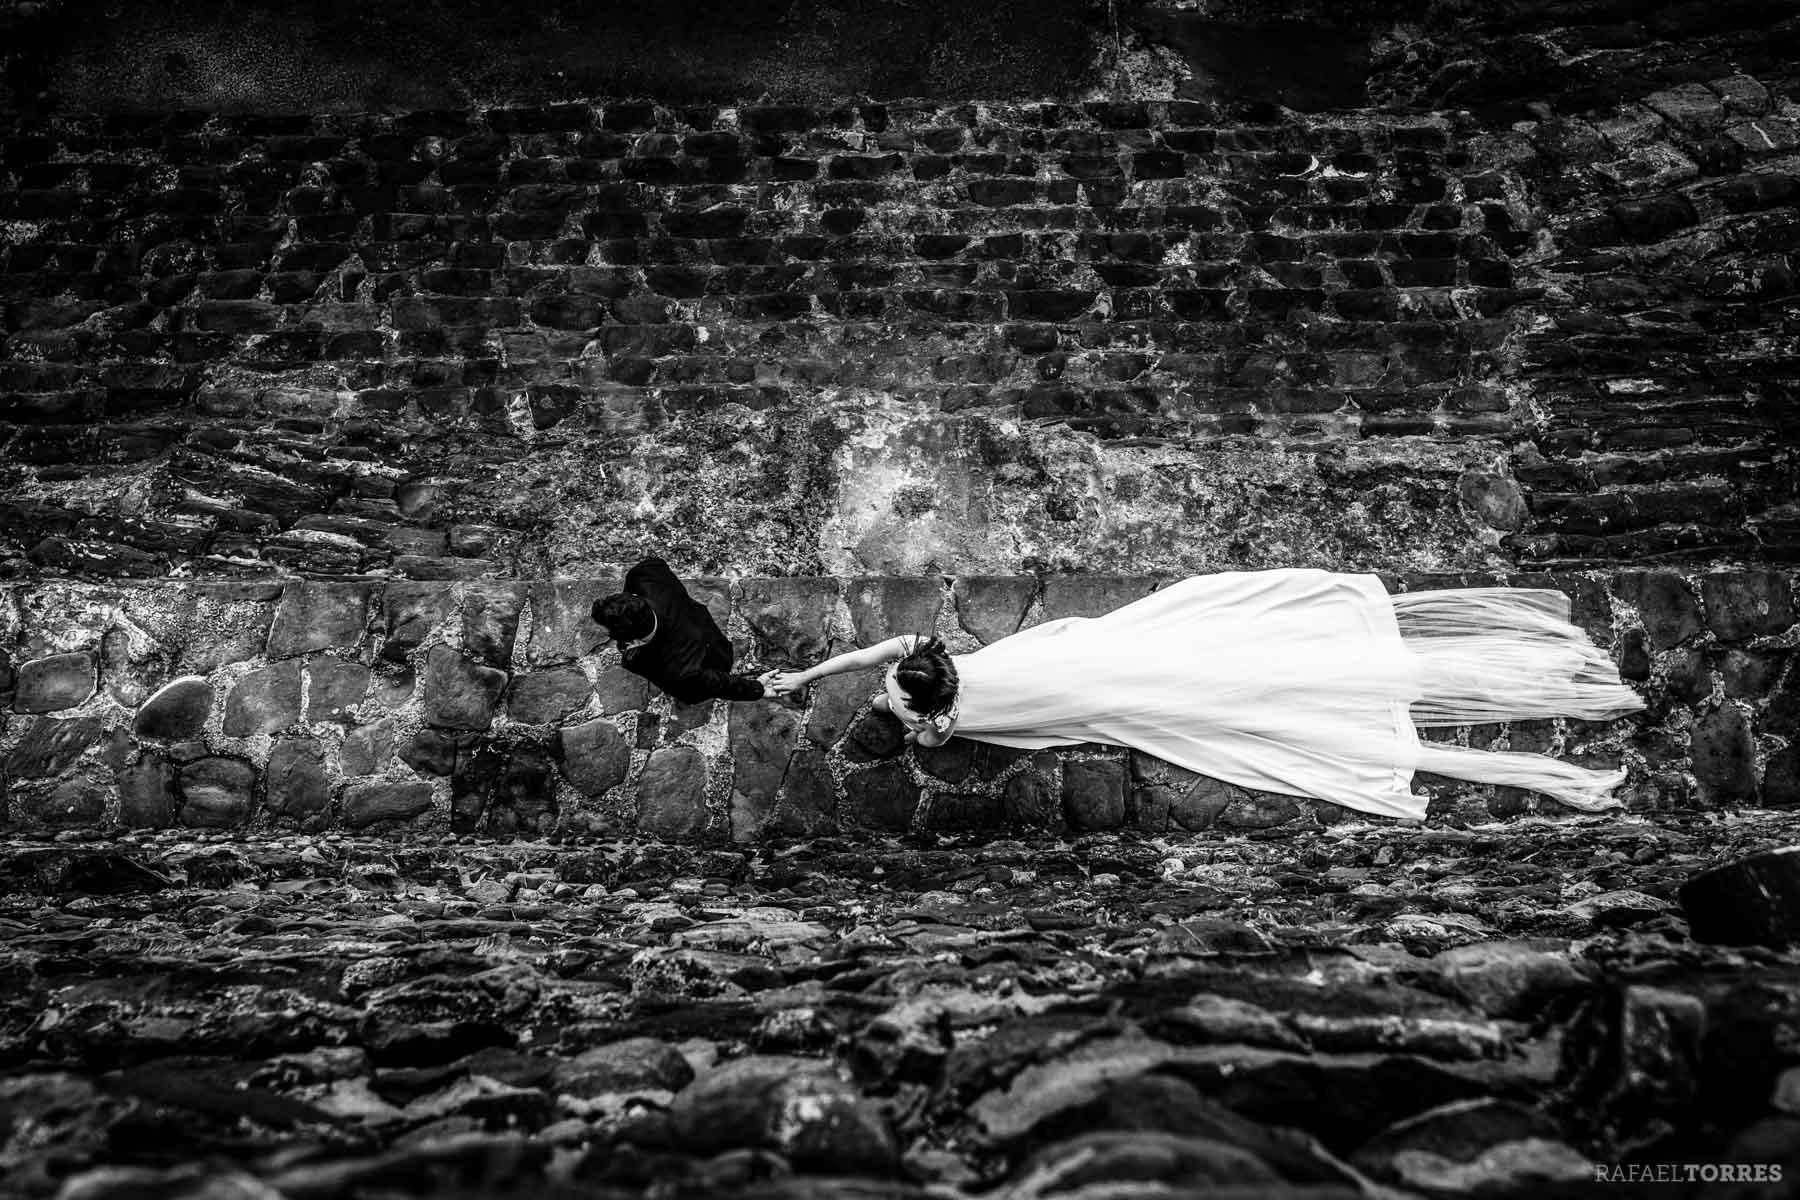 bea-juan-carmona-fotografo-boda-en-sevilla-rafael-torres-photo-1-2.jpg